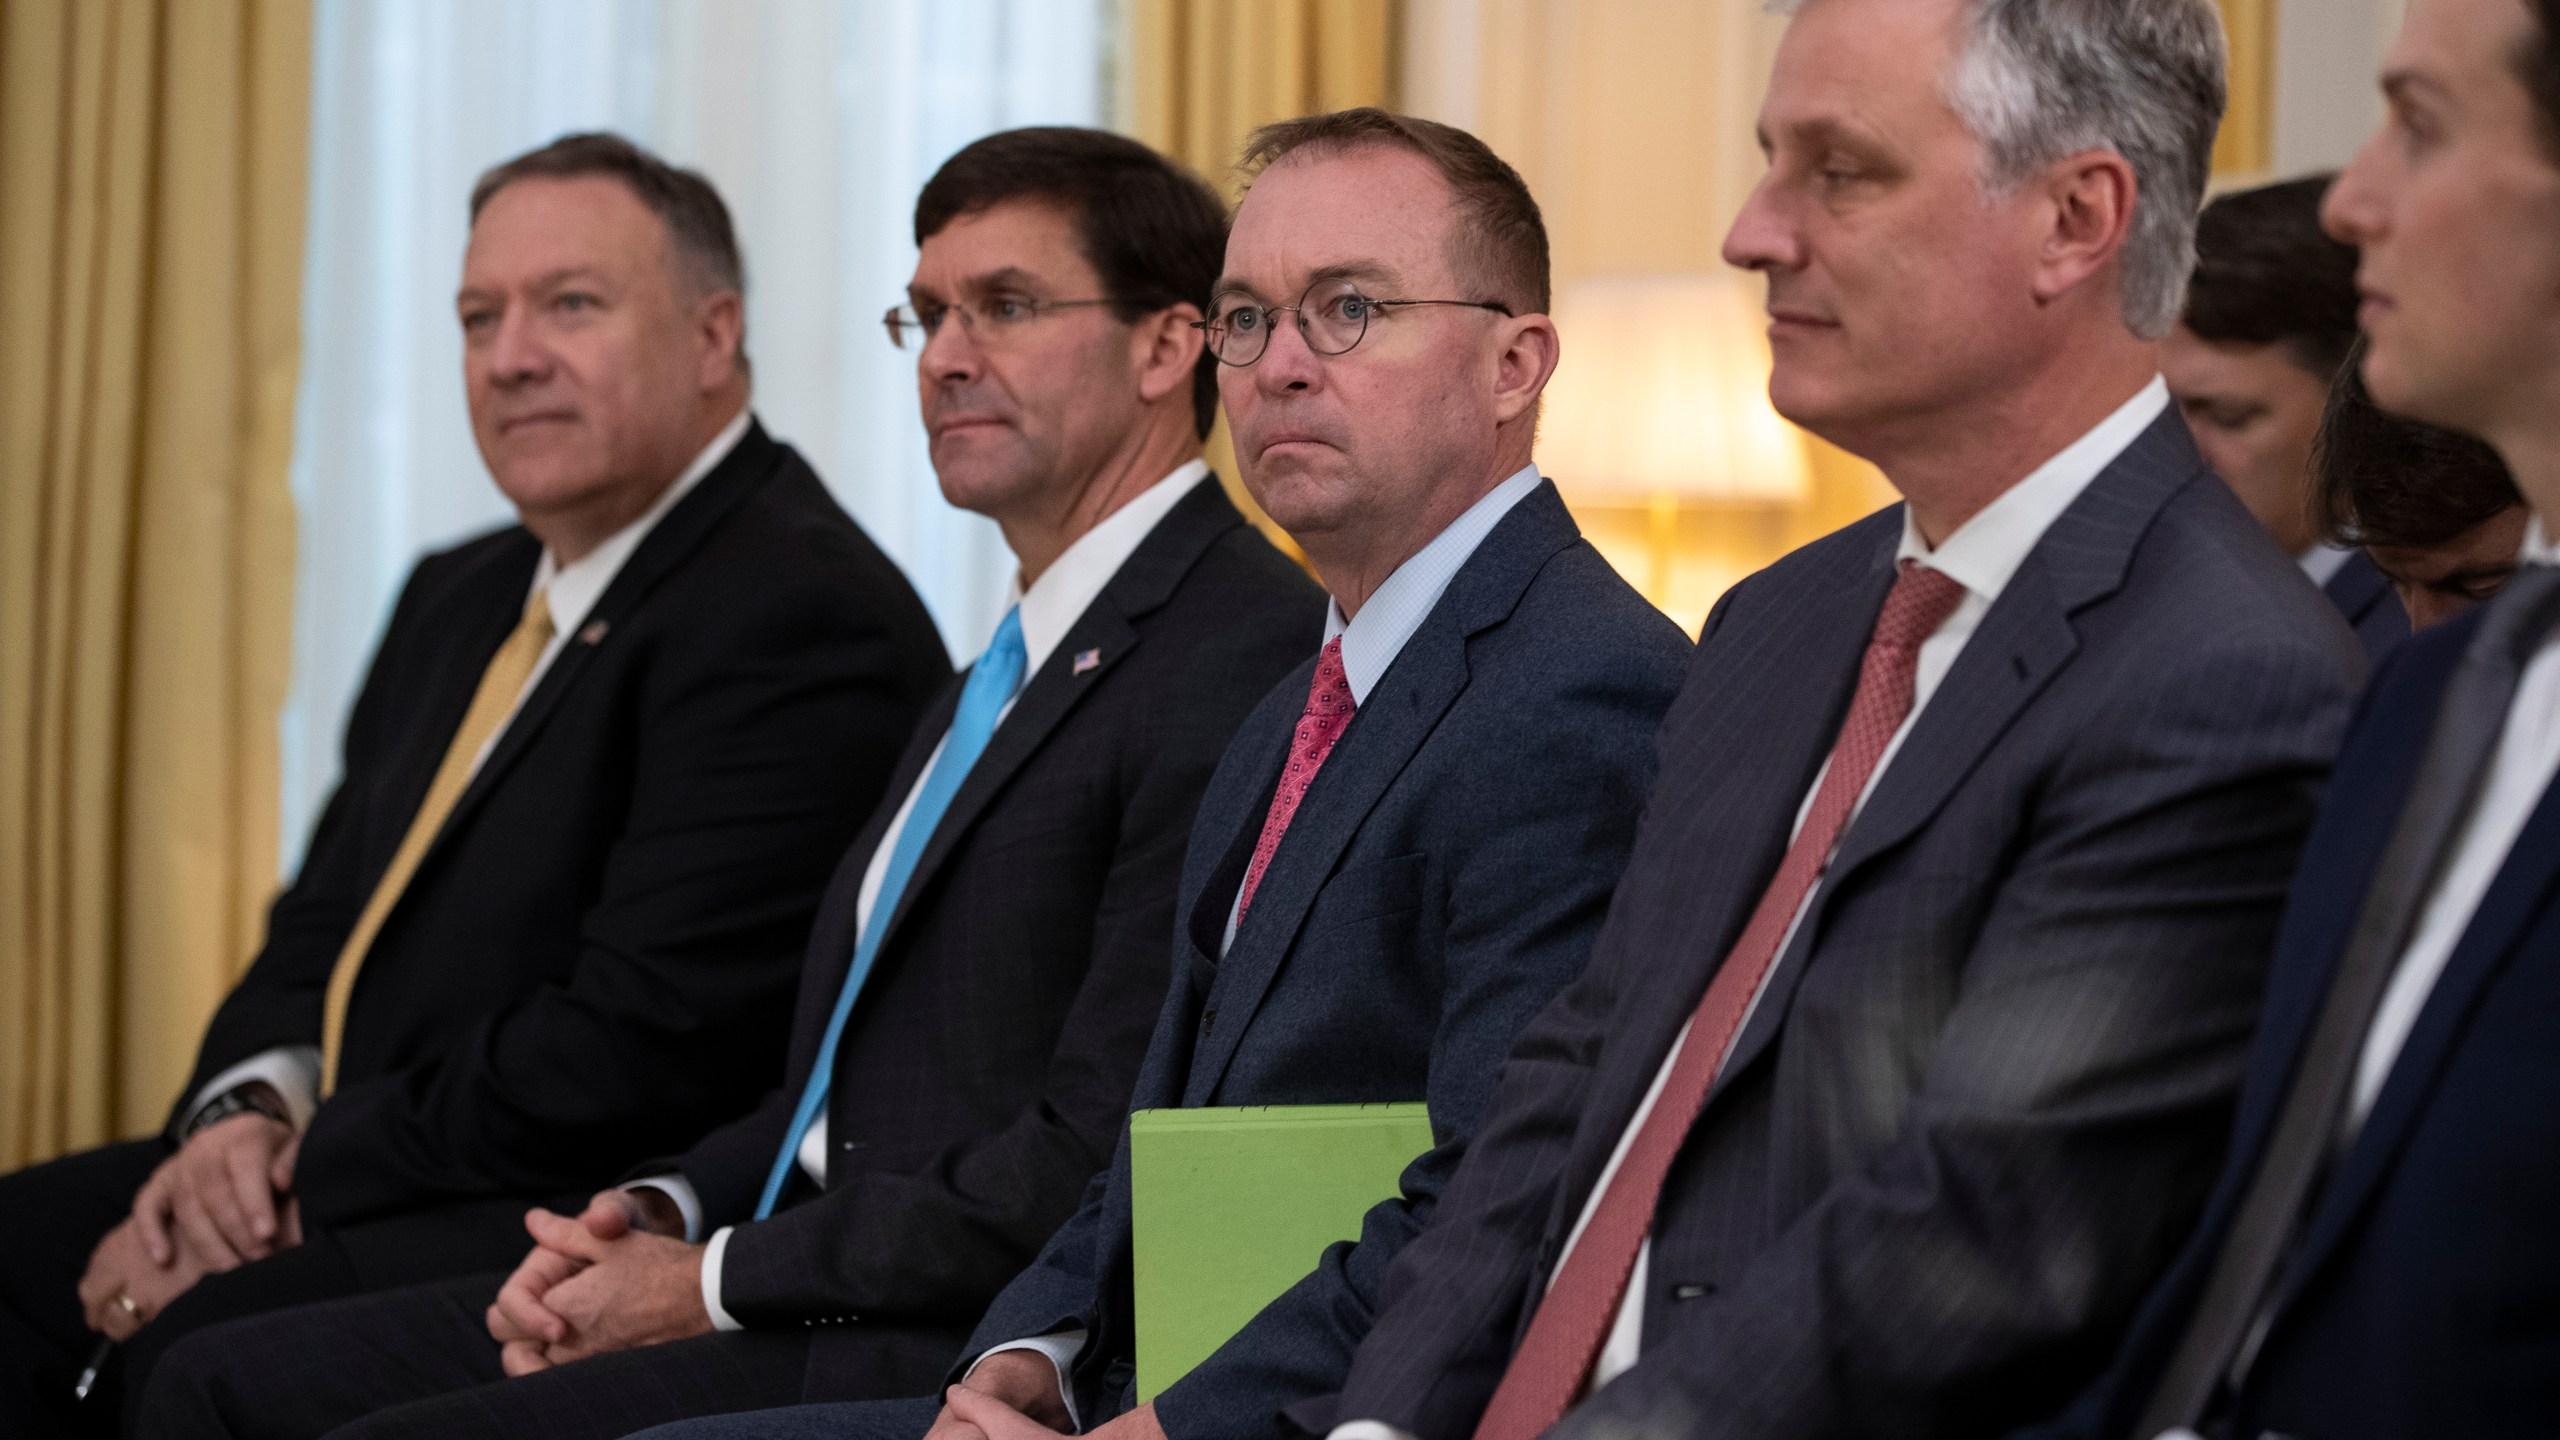 Mike Pompeo, Mark Esper, Mick Mulvaney, Robert C. O'Brien, Jared Kushner